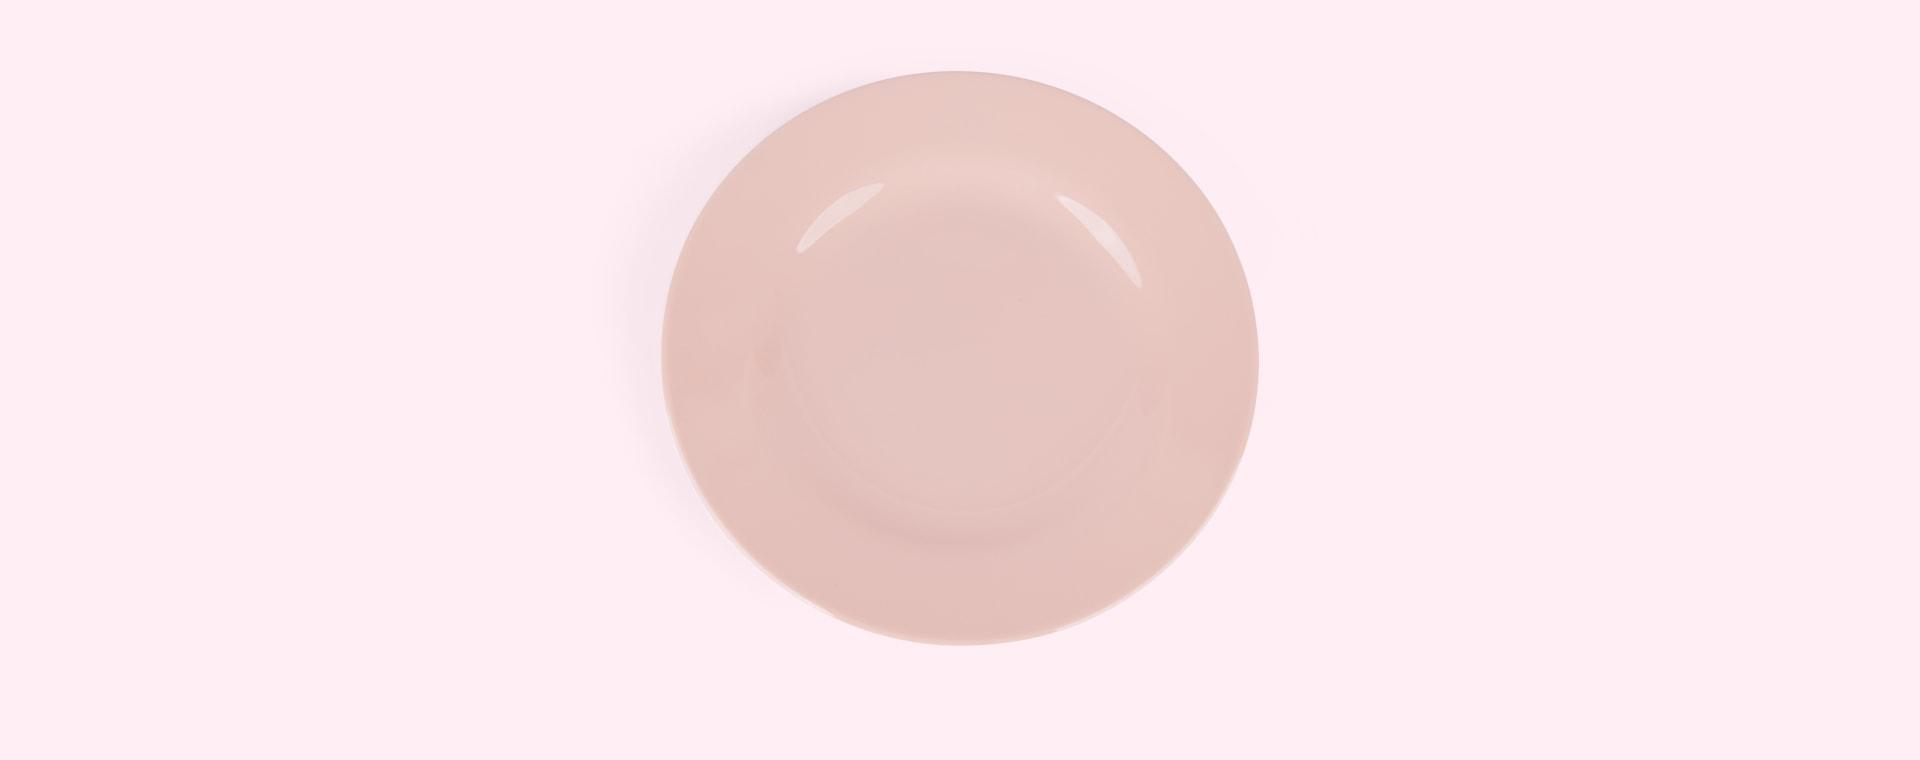 Pink Rice Melamine Plate